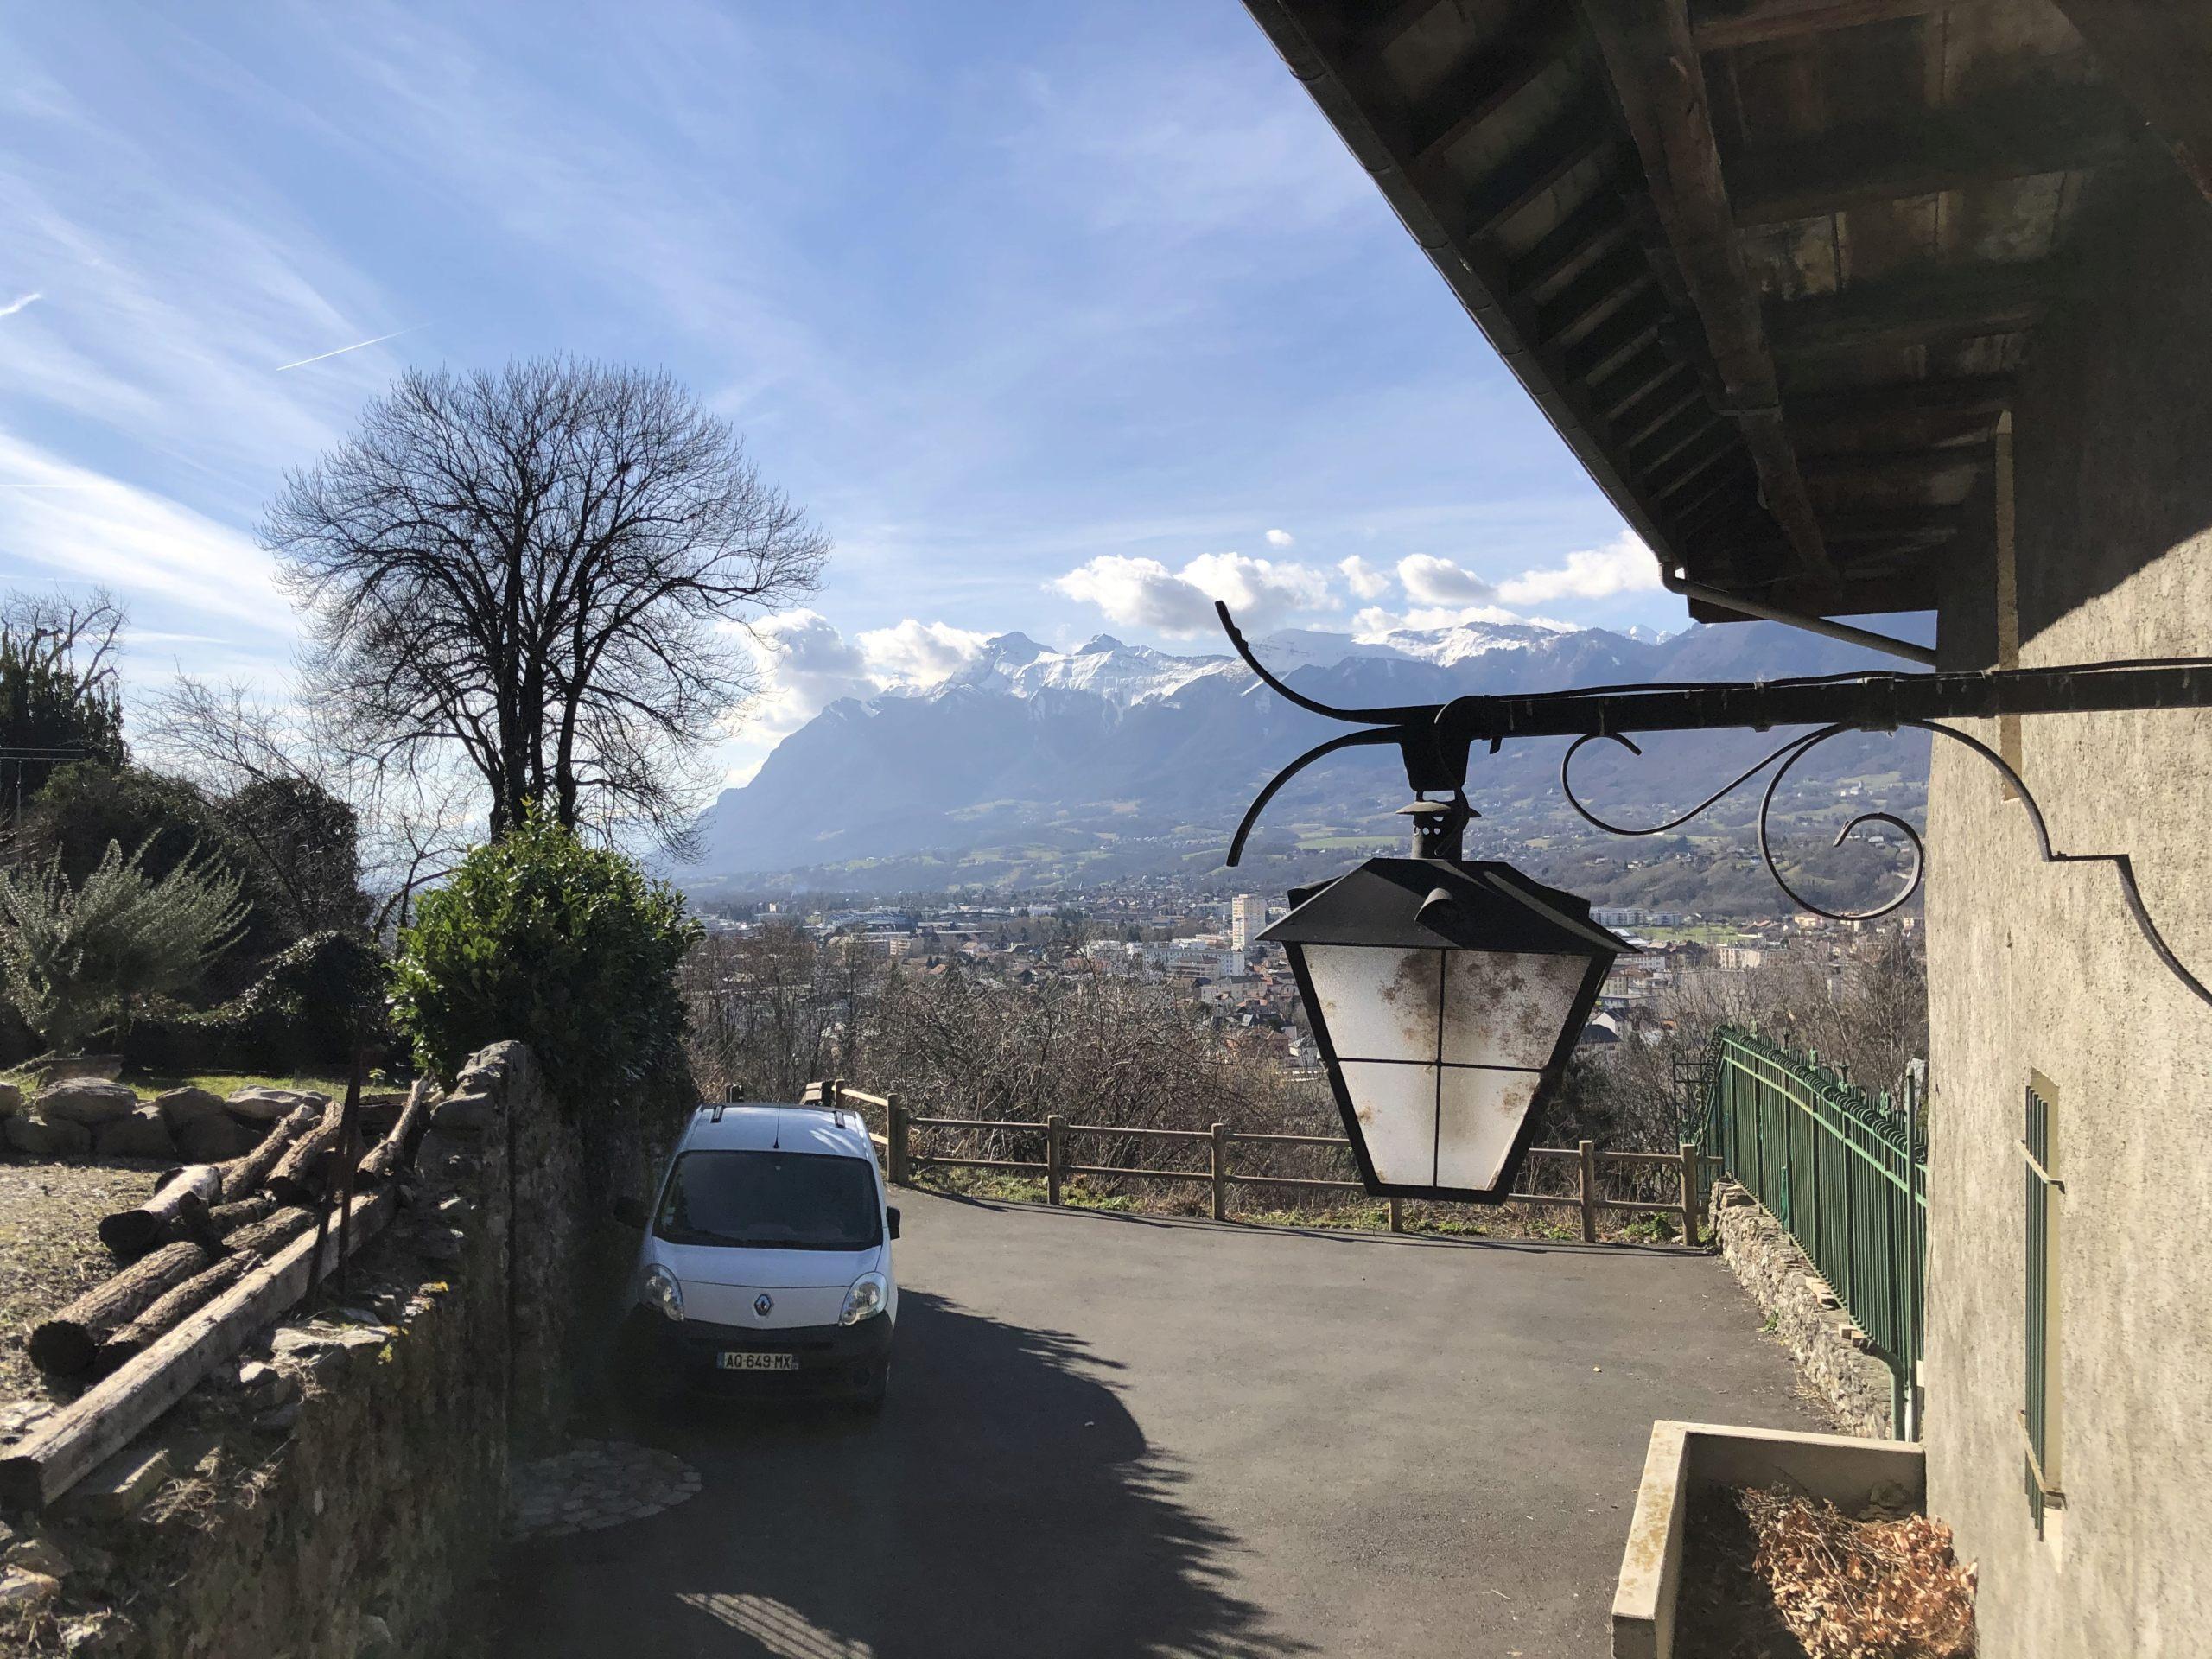 Petites balades en Rhône-Alpes - Page 2 Confla17